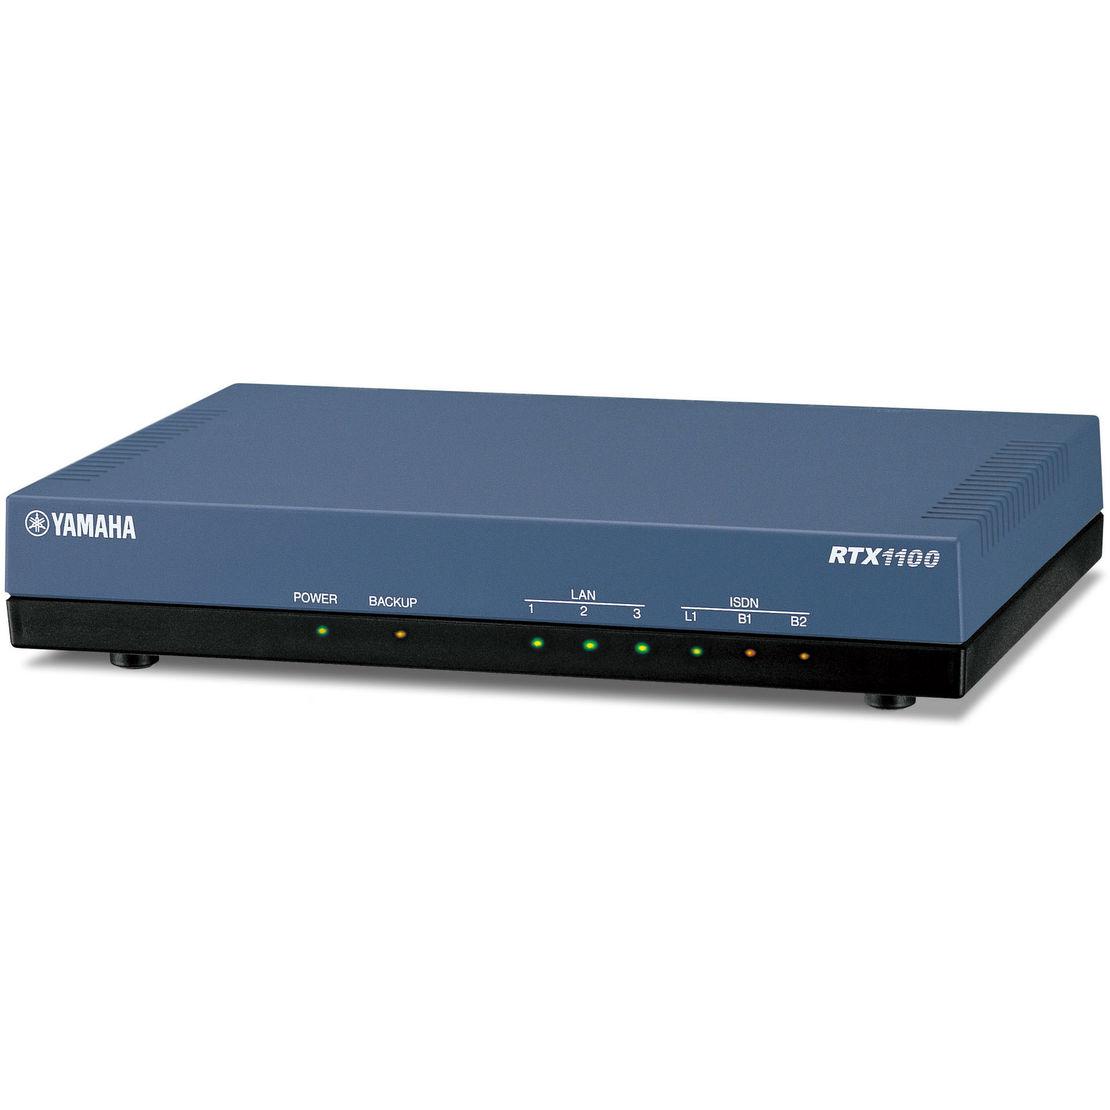 rtx-810 ファームウェア